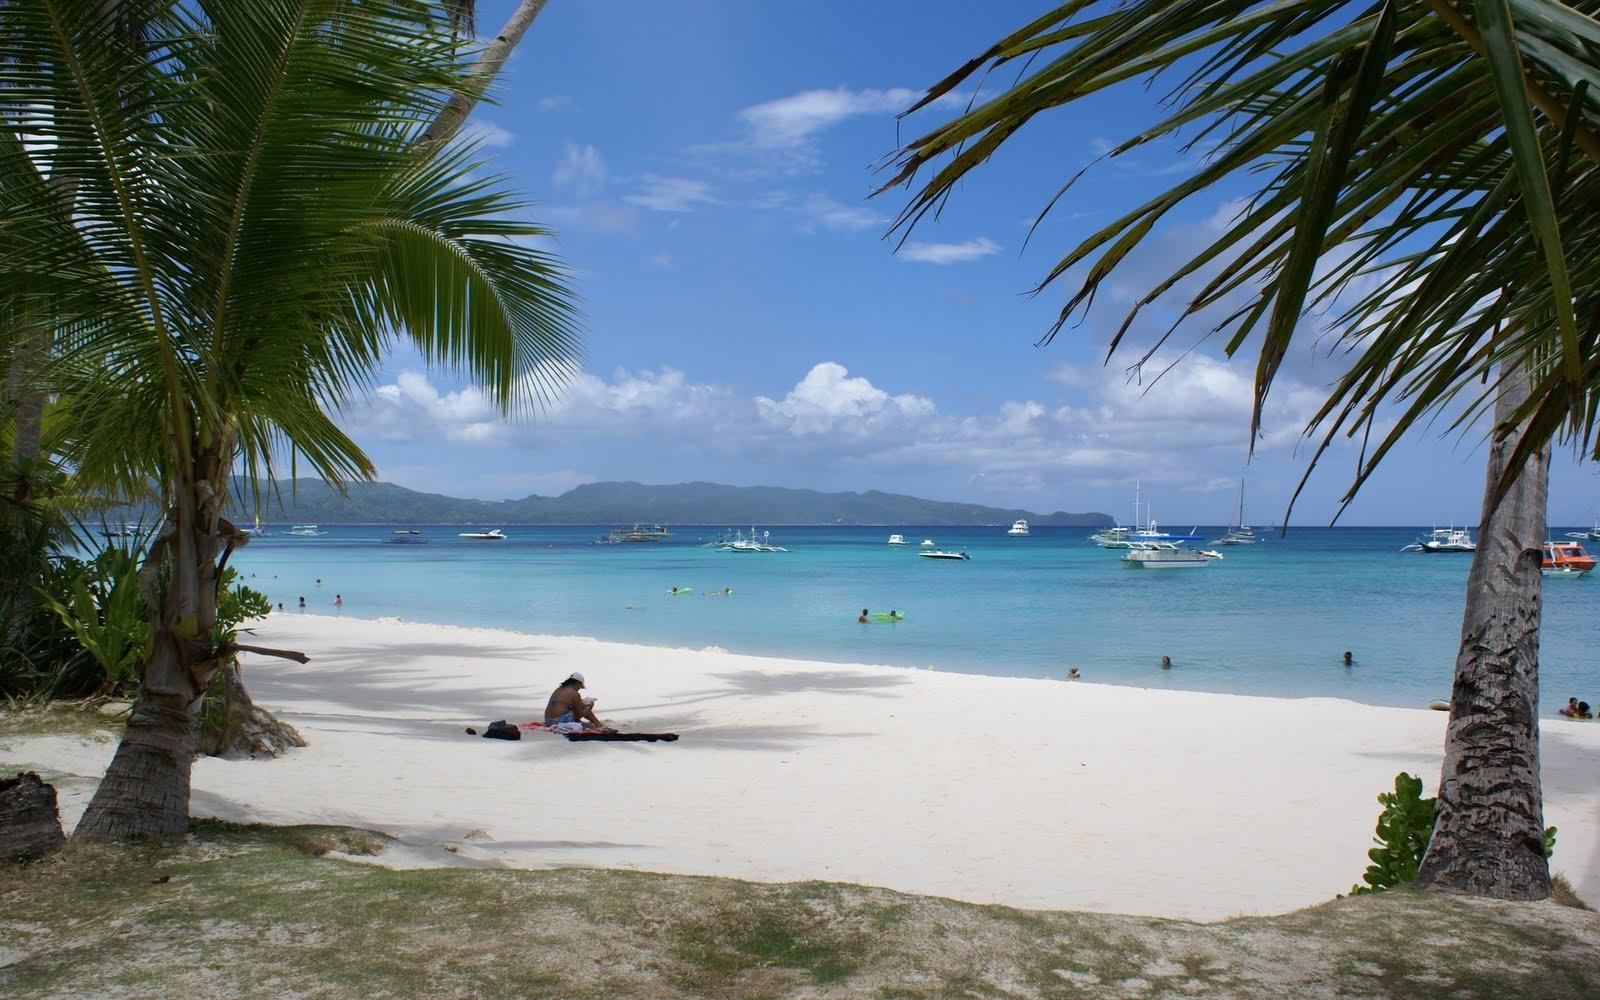 http://1.bp.blogspot.com/_2IU2Nt4rD1k/THuobDRfEJI/AAAAAAAACB0/tgFMwlACrUE/s1600/beach_wallpaper_9.jpg